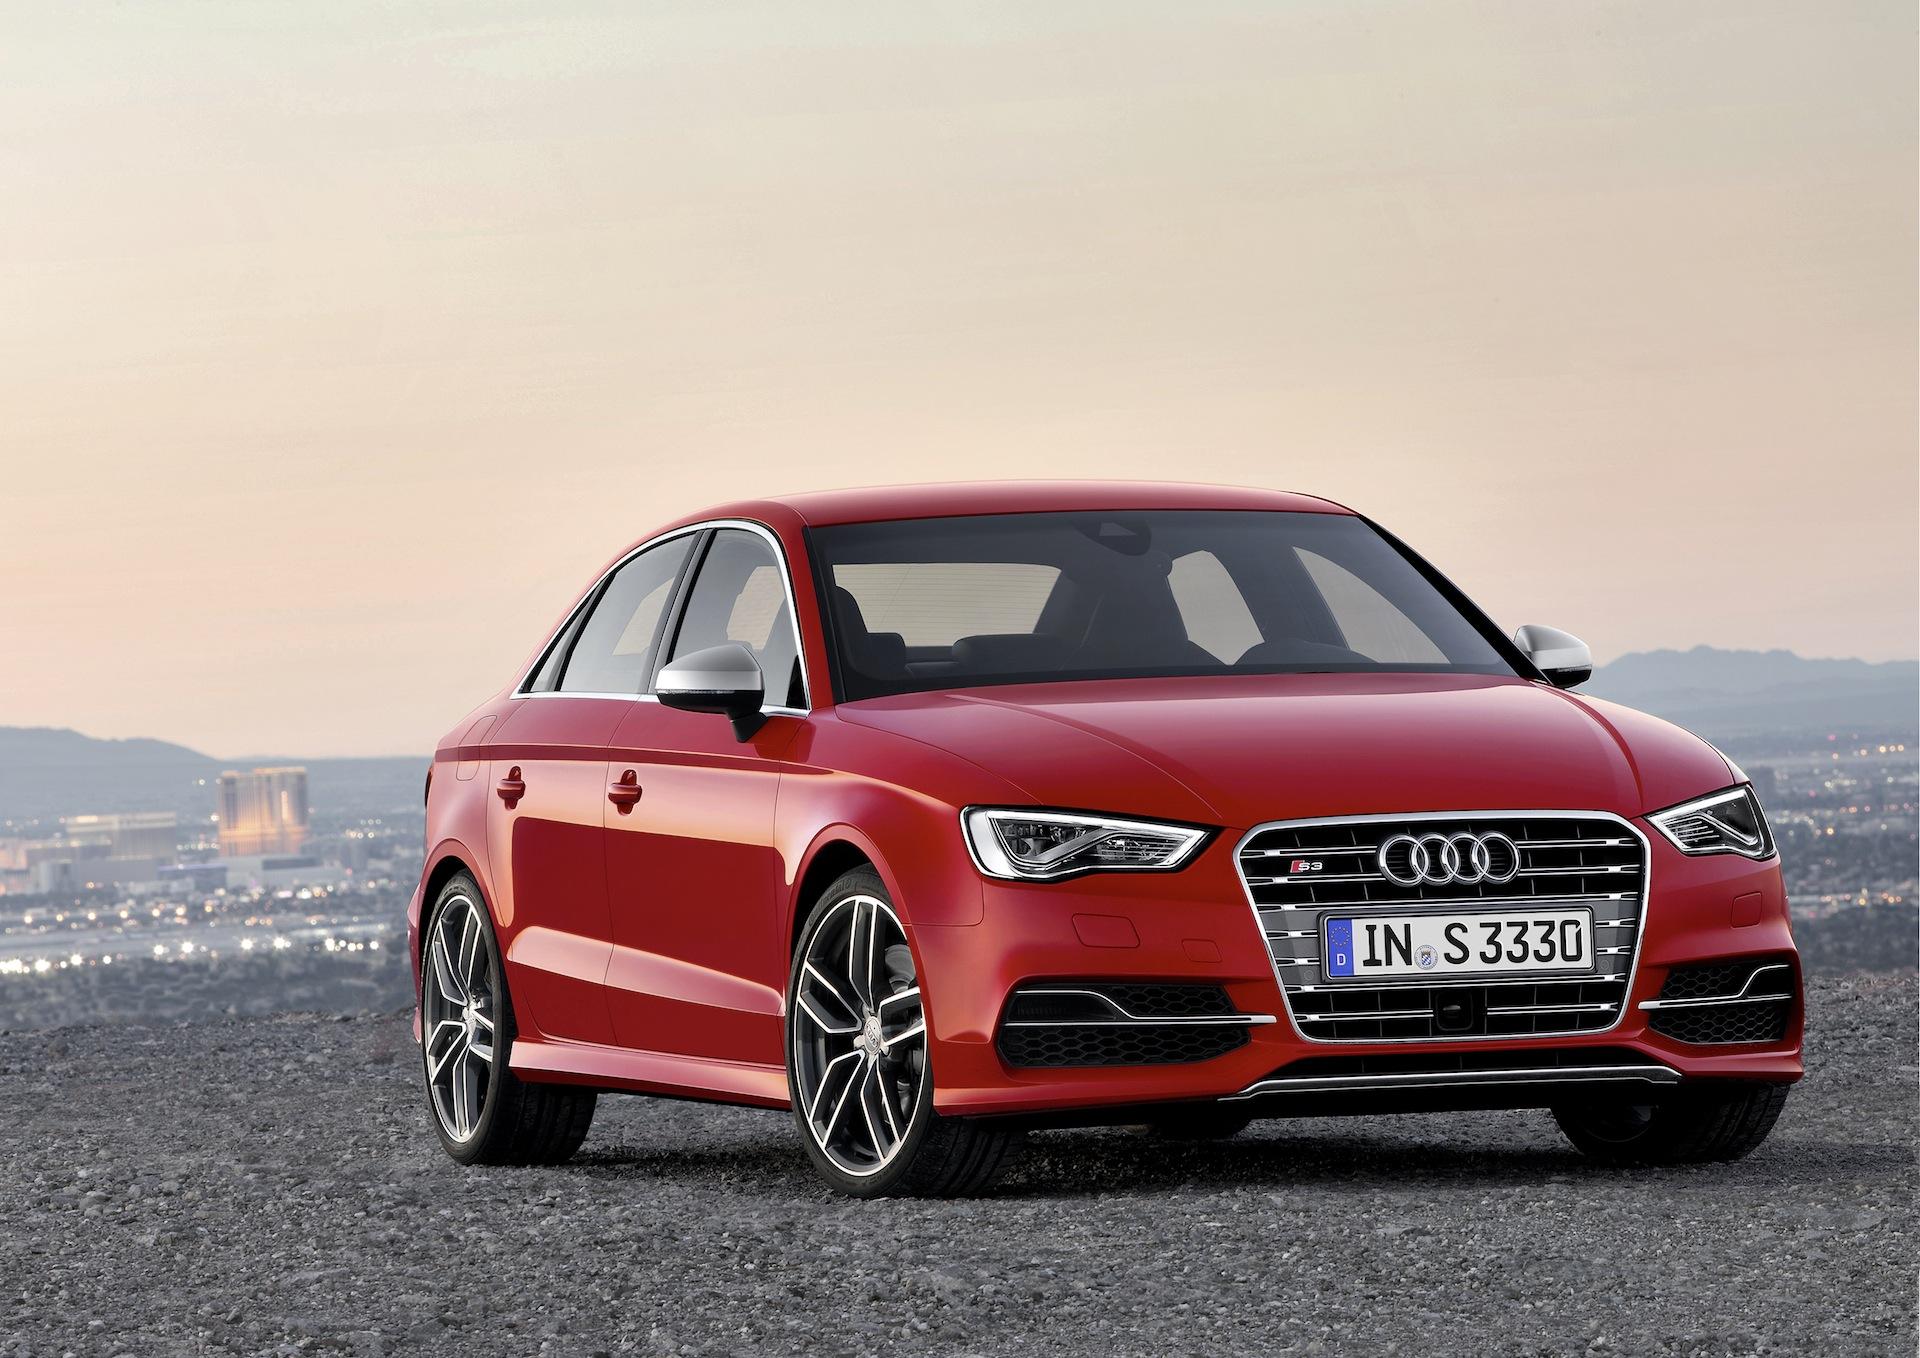 Kelebihan Audi 2015 Review